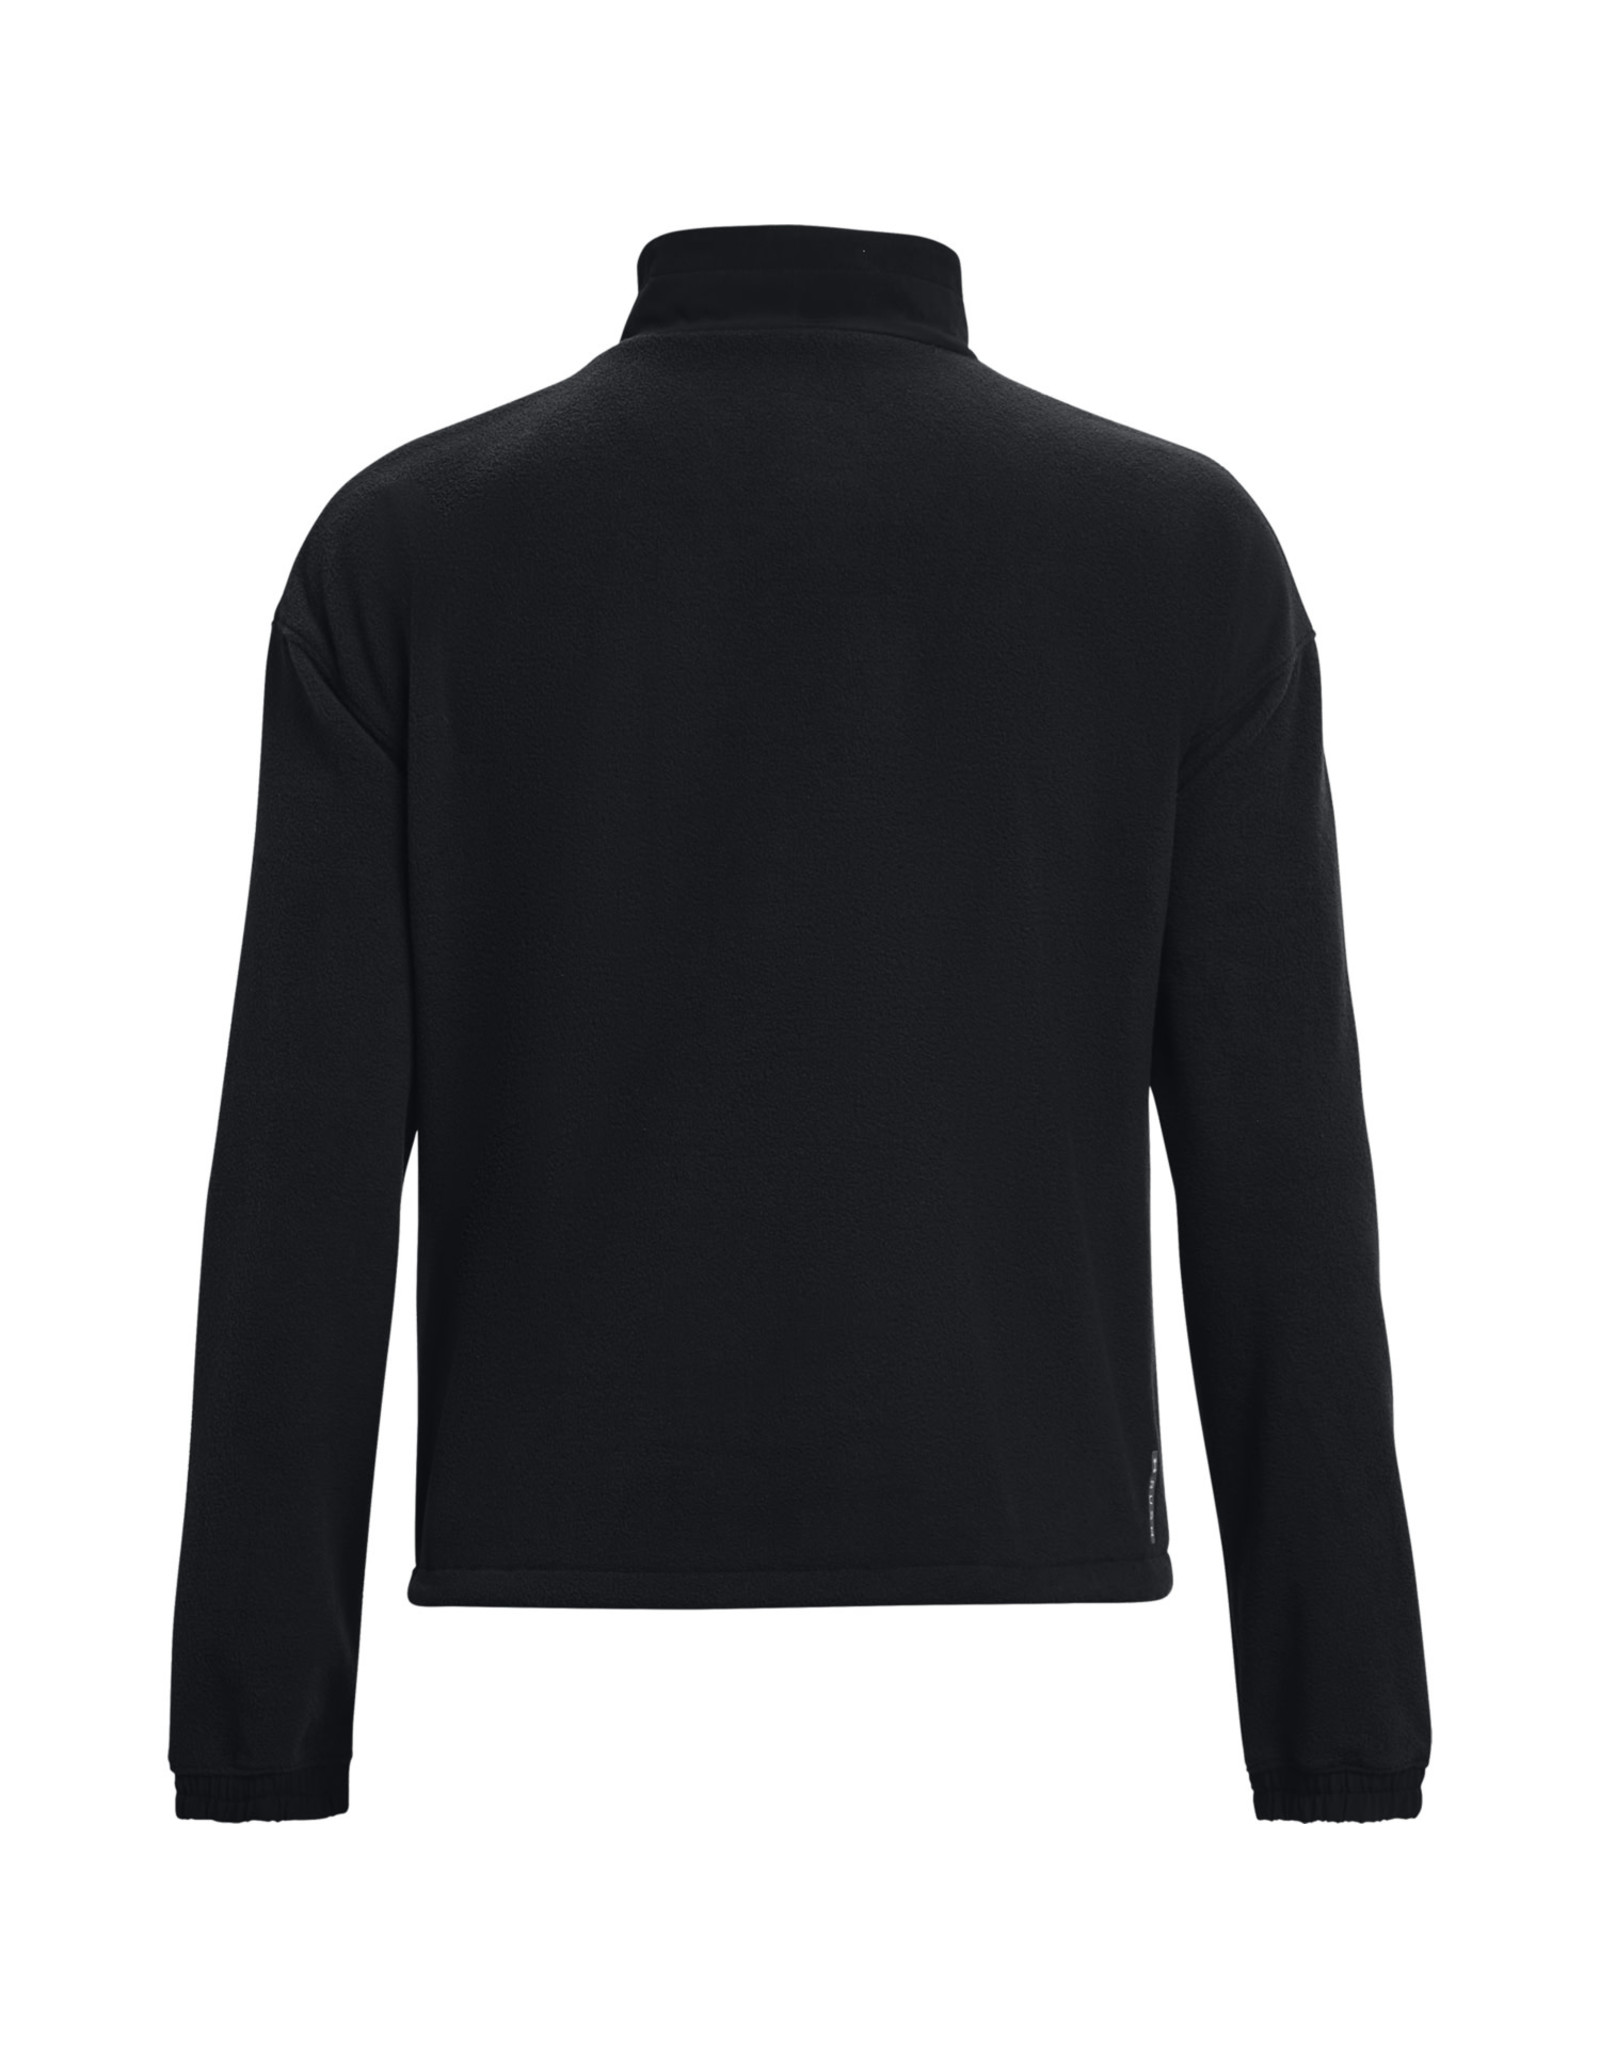 Under Armour UA Rush Fleece 1/2 Zip-Black